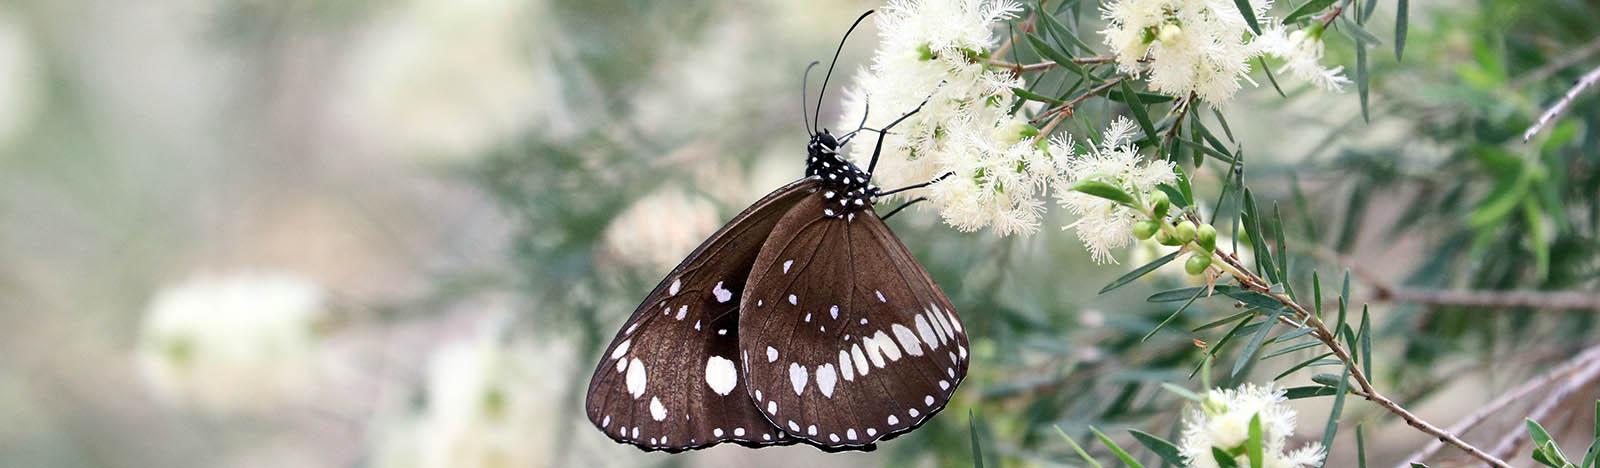 Euploea core, 'Common Crow Butterfly' (image by Damon Ramsey)